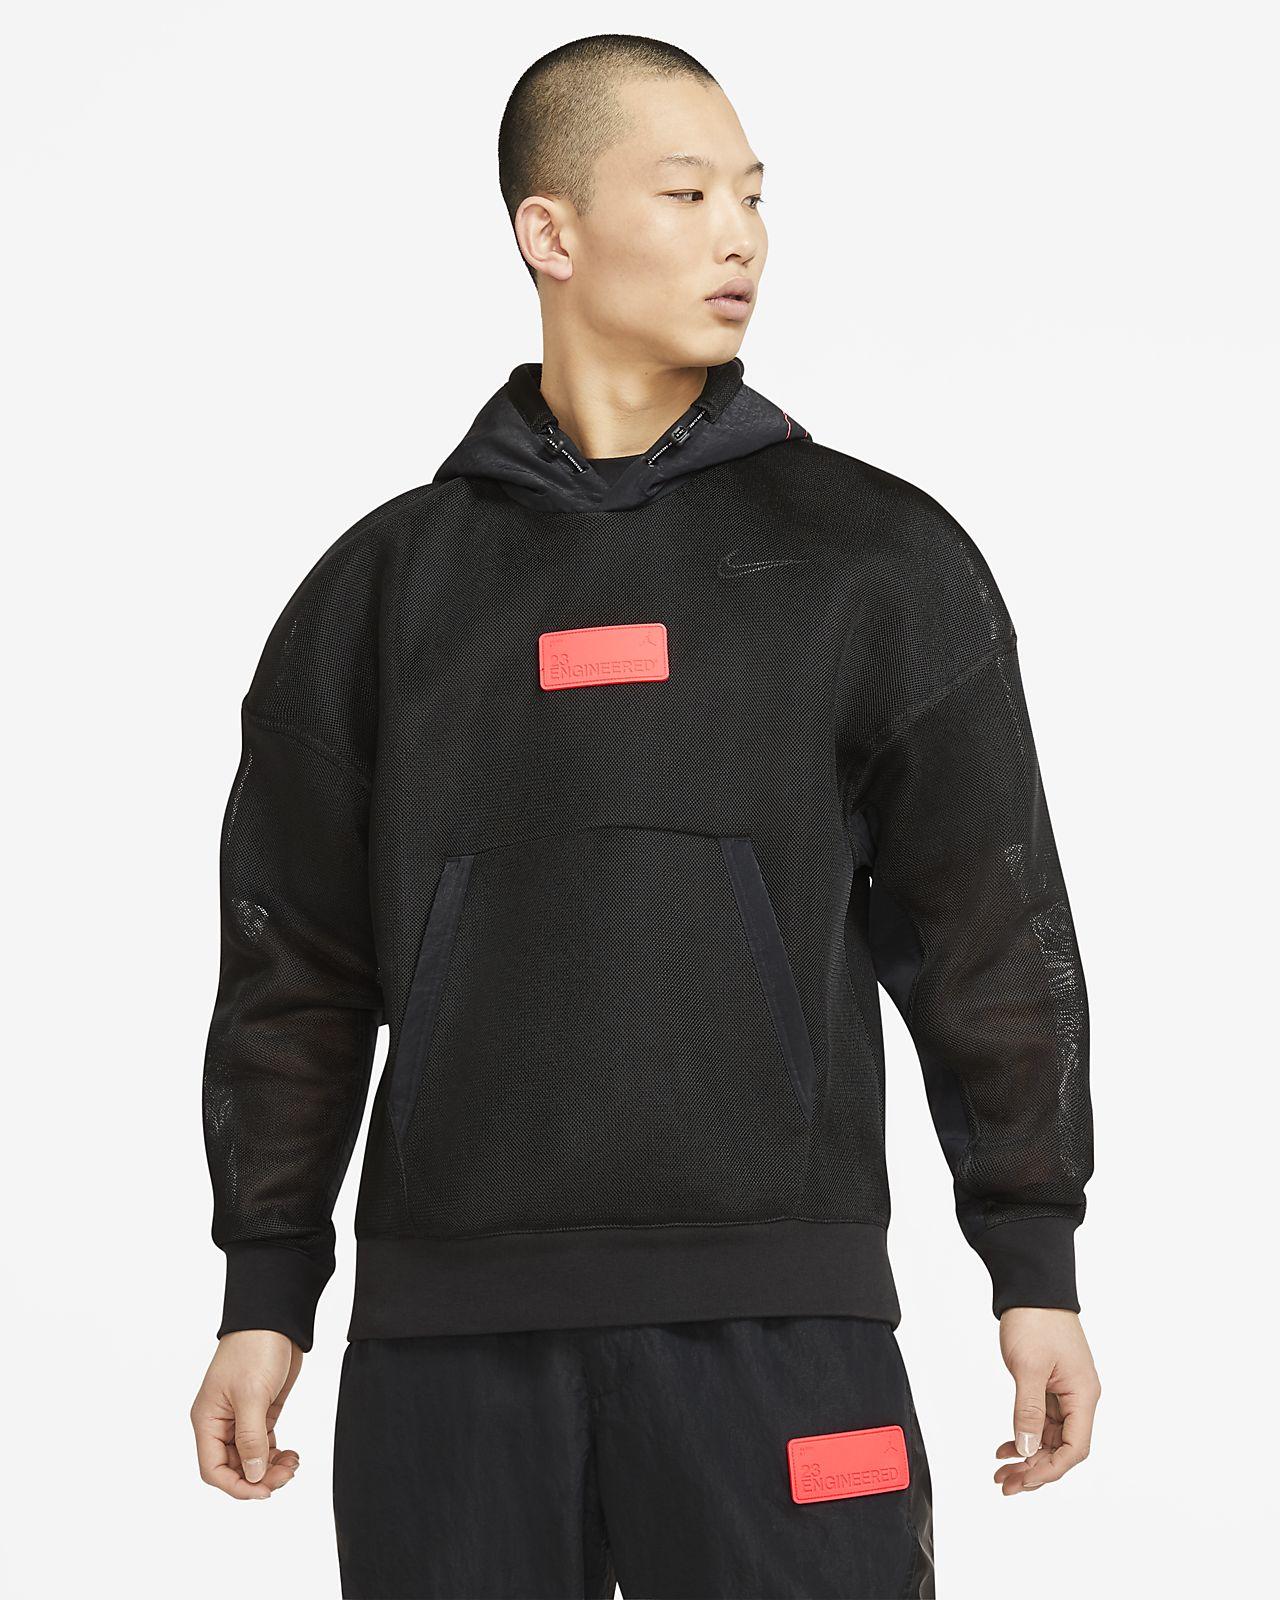 Męska bluza z siateczki Jordan 23 Engineered